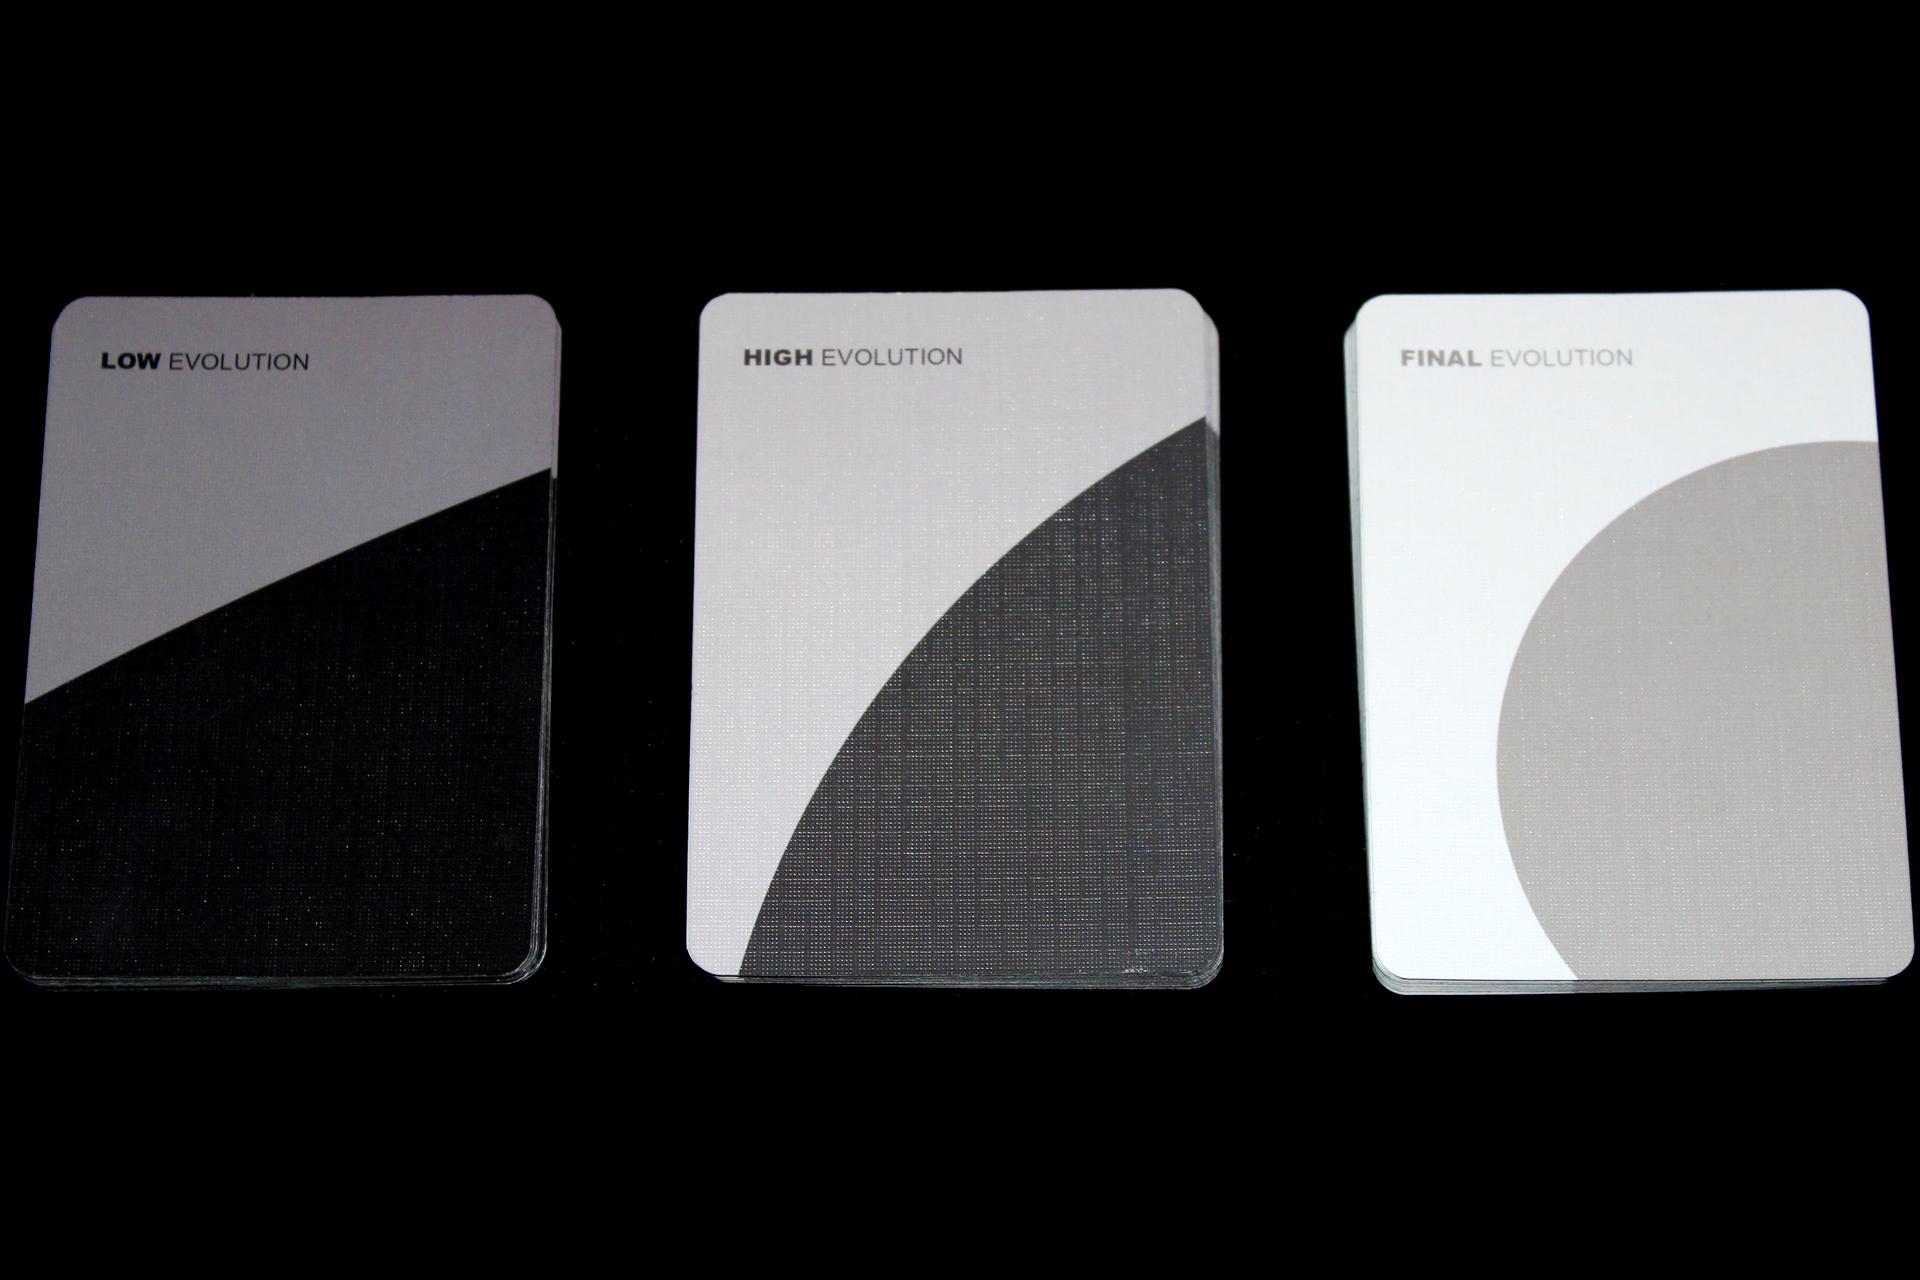 Evolution Cards.jpg